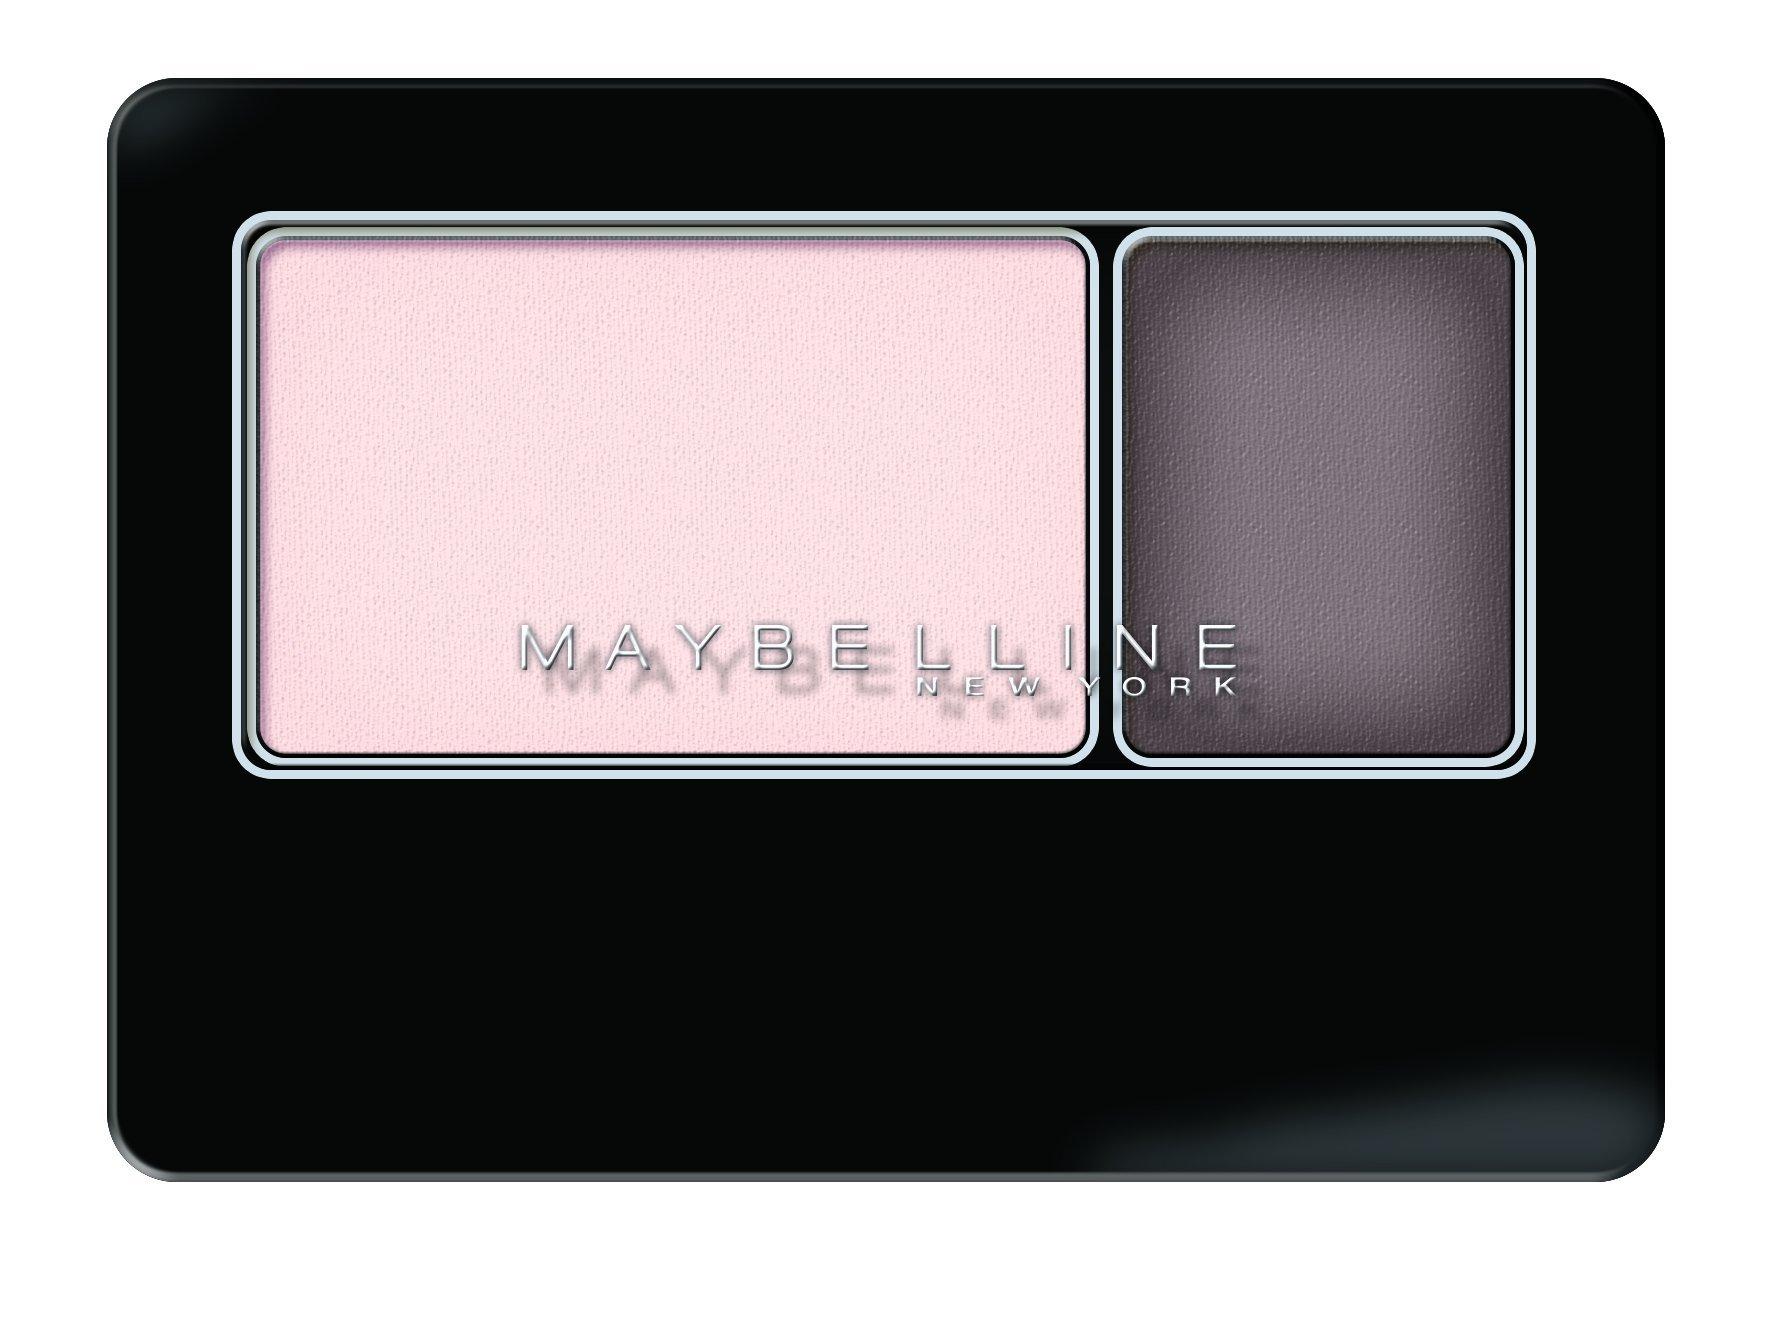 Maybelline New York Expert Wear Eyeshadow, Dusk, Duos, 0.08 Ounce